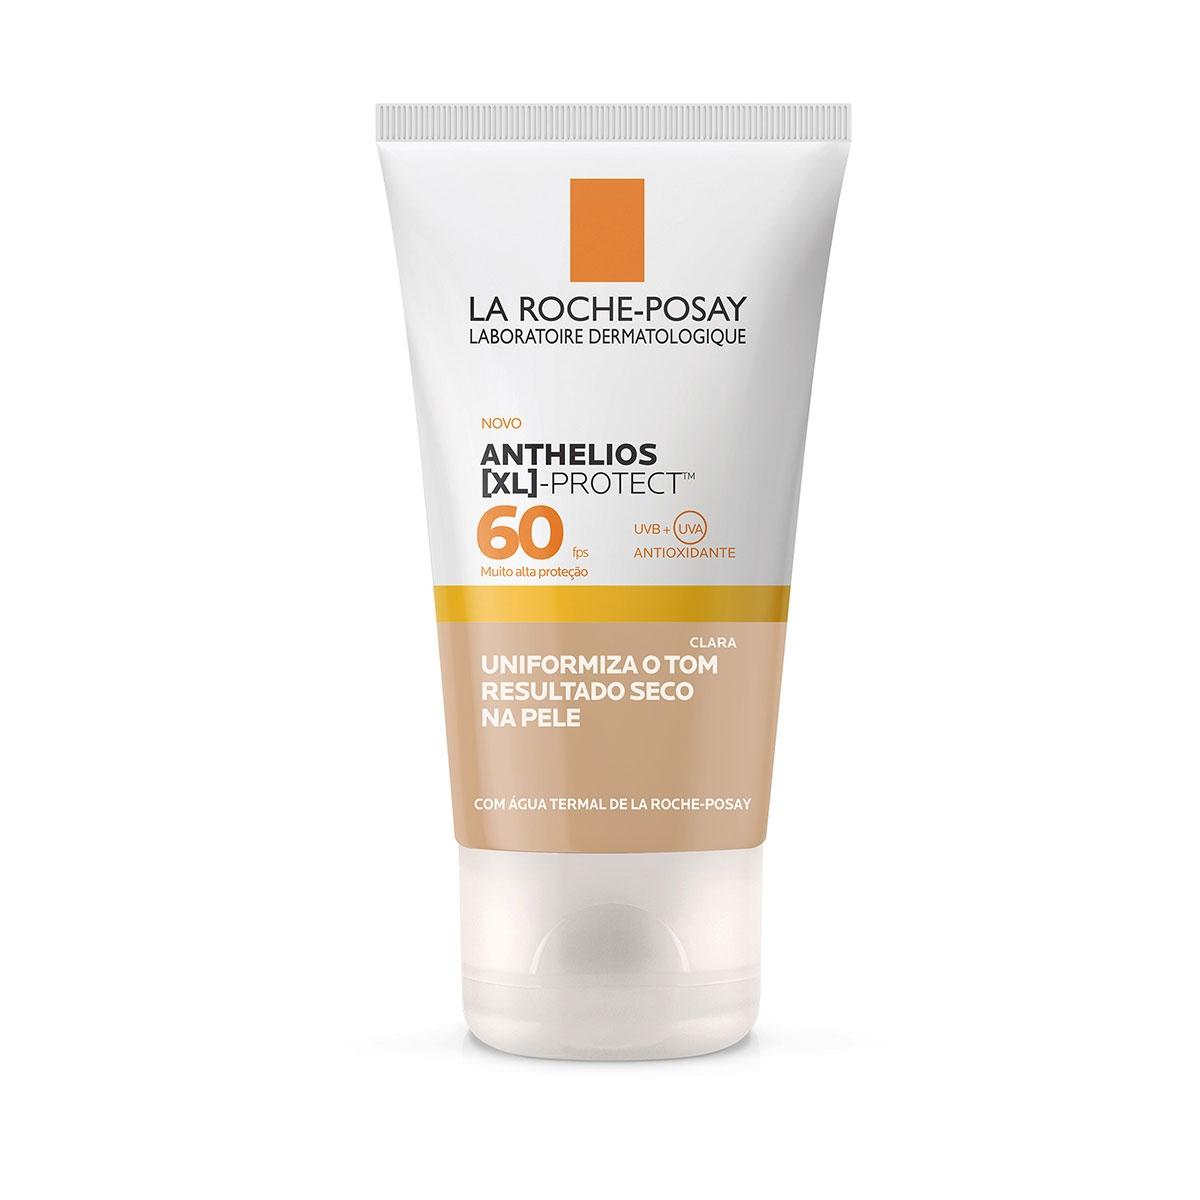 Protetor Solar Facial La Roche-Posay Anthelios XL Protect Cor Clara FPS 60 com 40g 40g